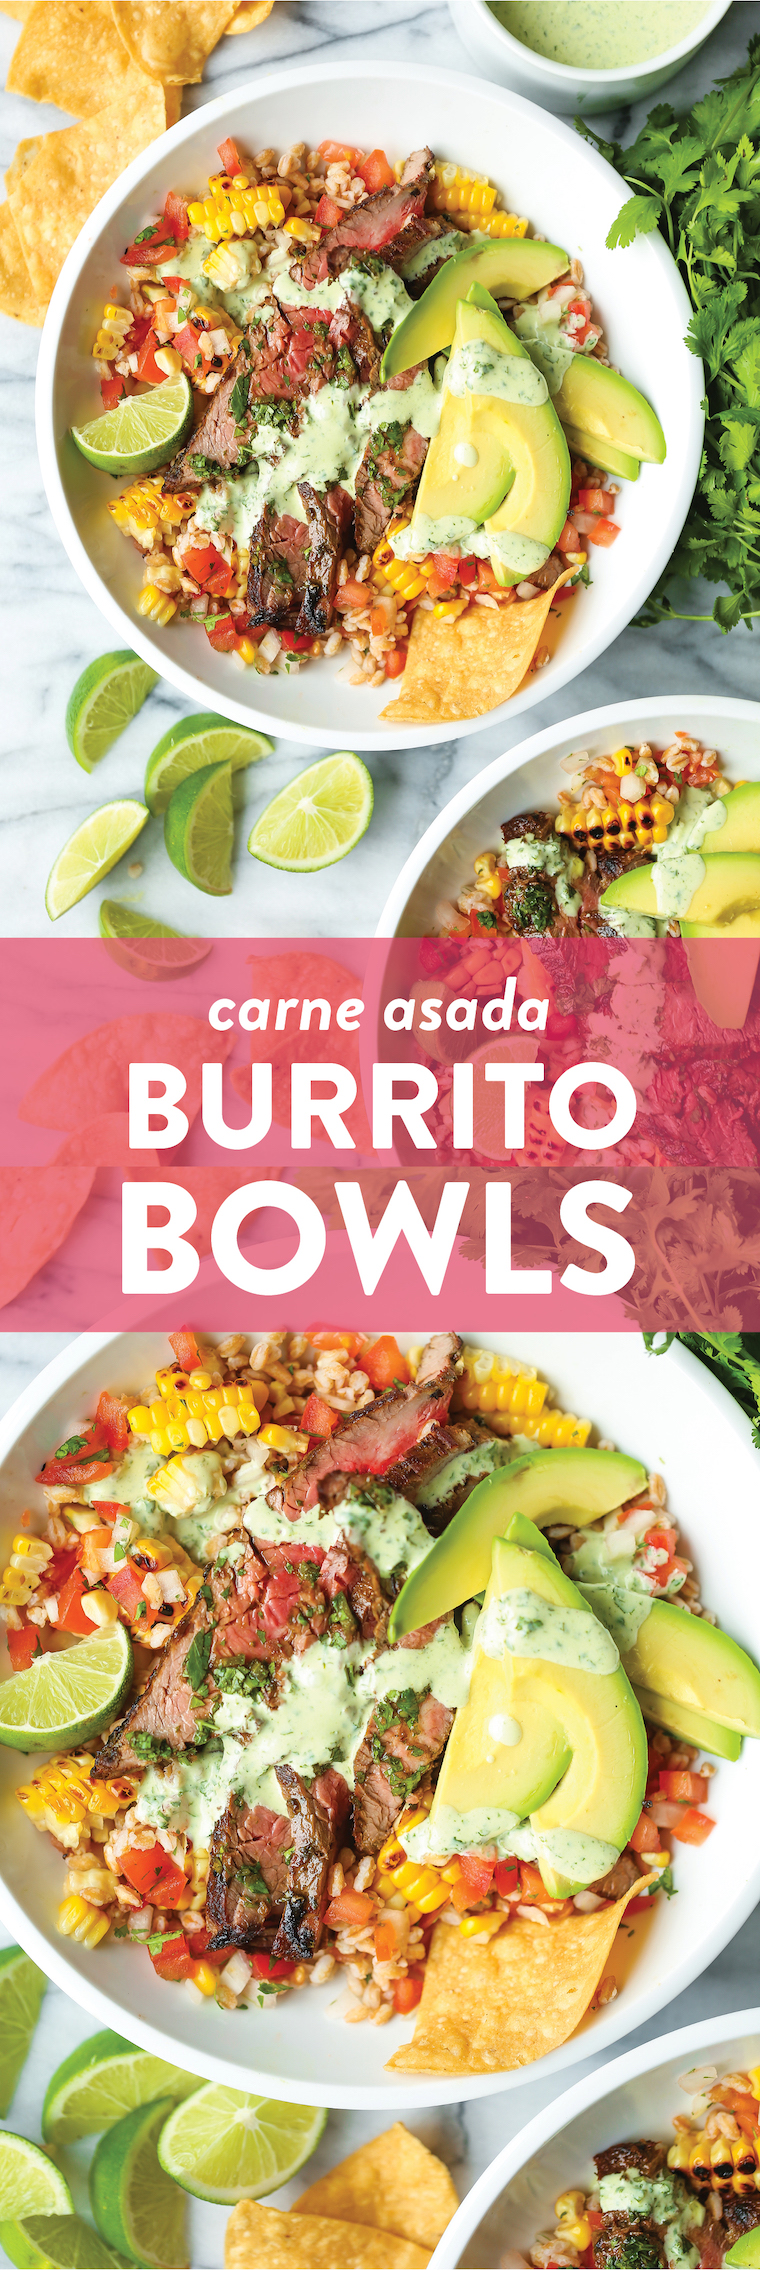 Carne Asada Burrito Bowls - Pico, corn, avocado, cilantro, lime wedges and the best carne asada EVER. Drizzled with cilantro lime vinaigrette. SO SO BOMB.